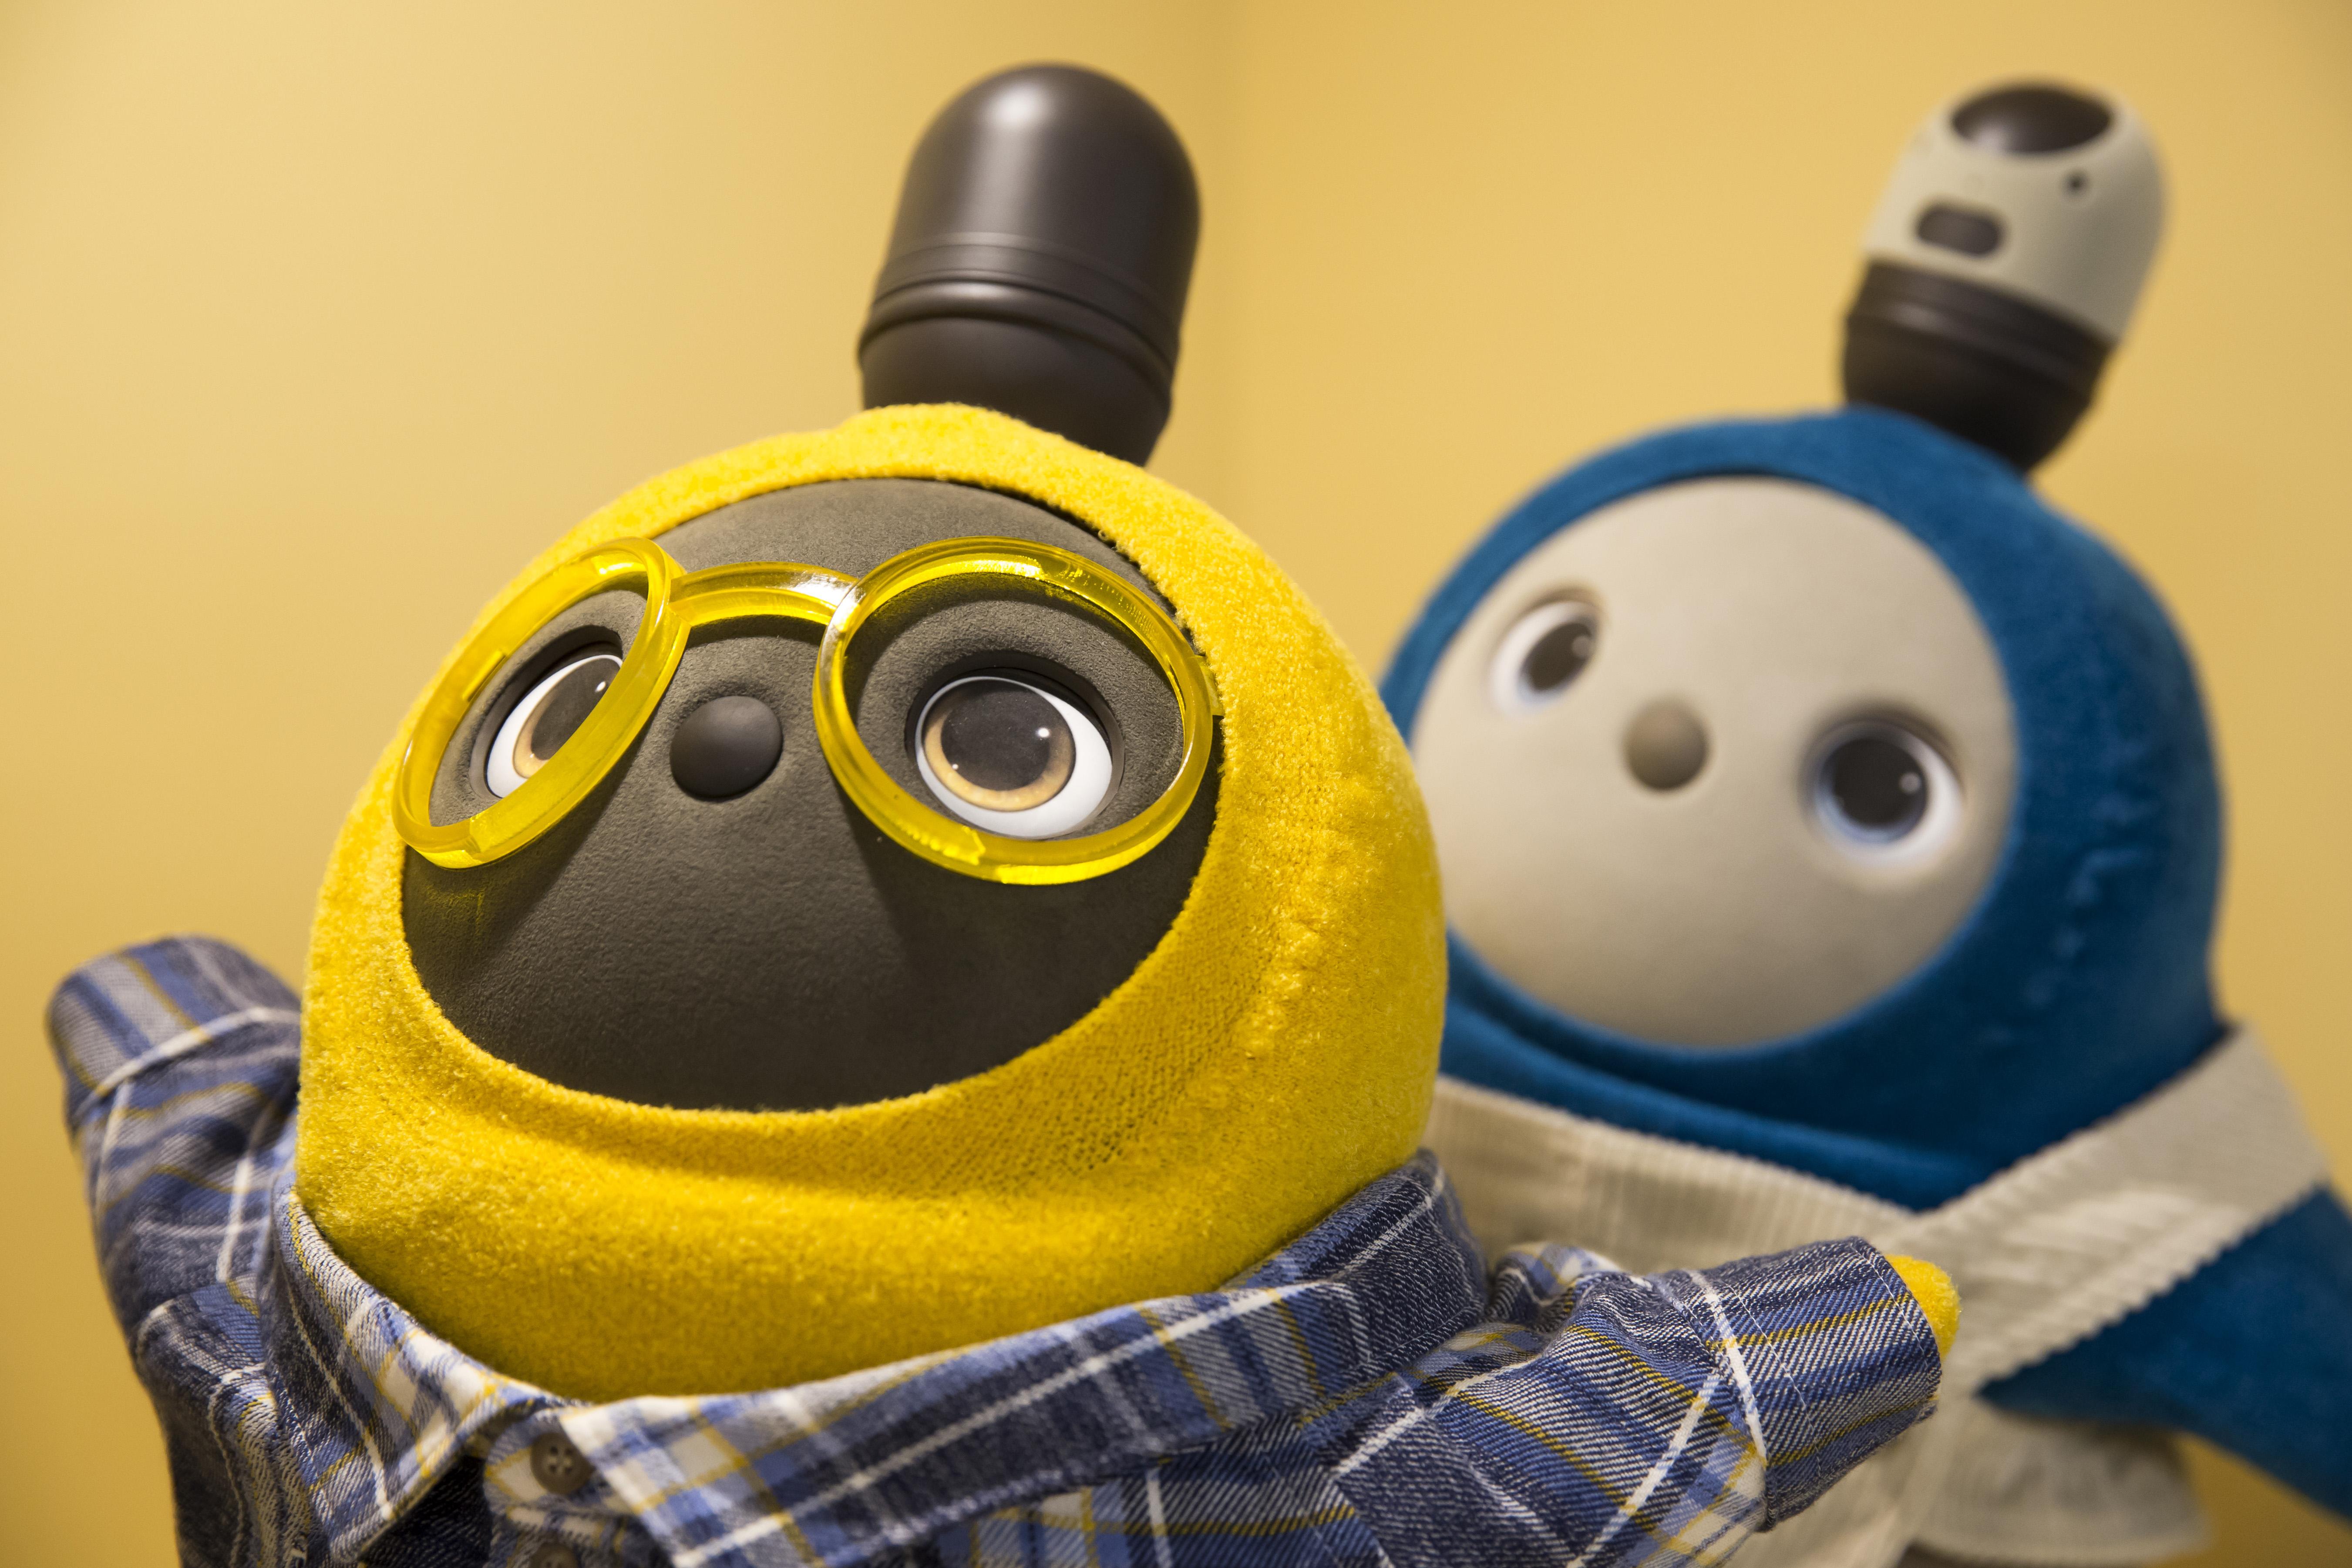 Lovot robots - The Minions meet Teletubbies.